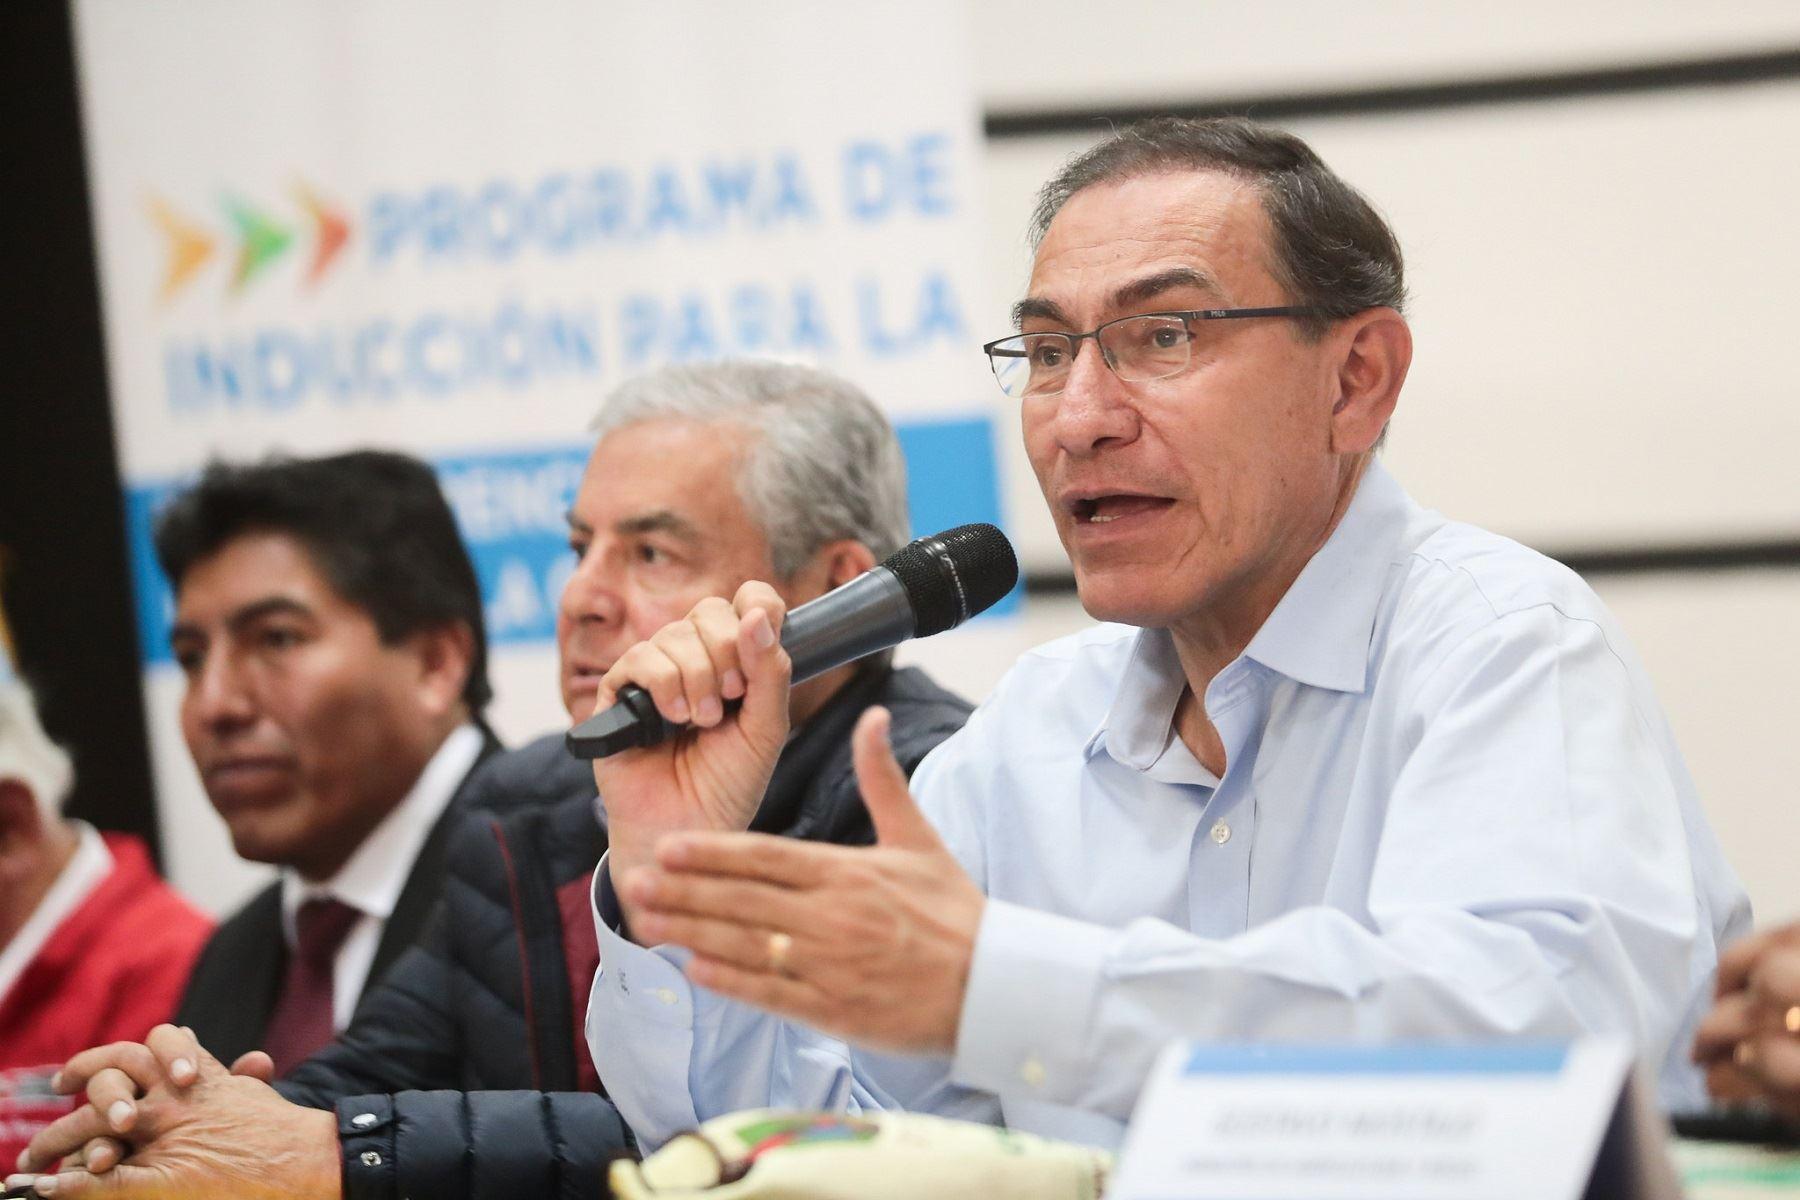 Presidente Vizcarra exhorta a autoridades electas a rechazar la corrupción